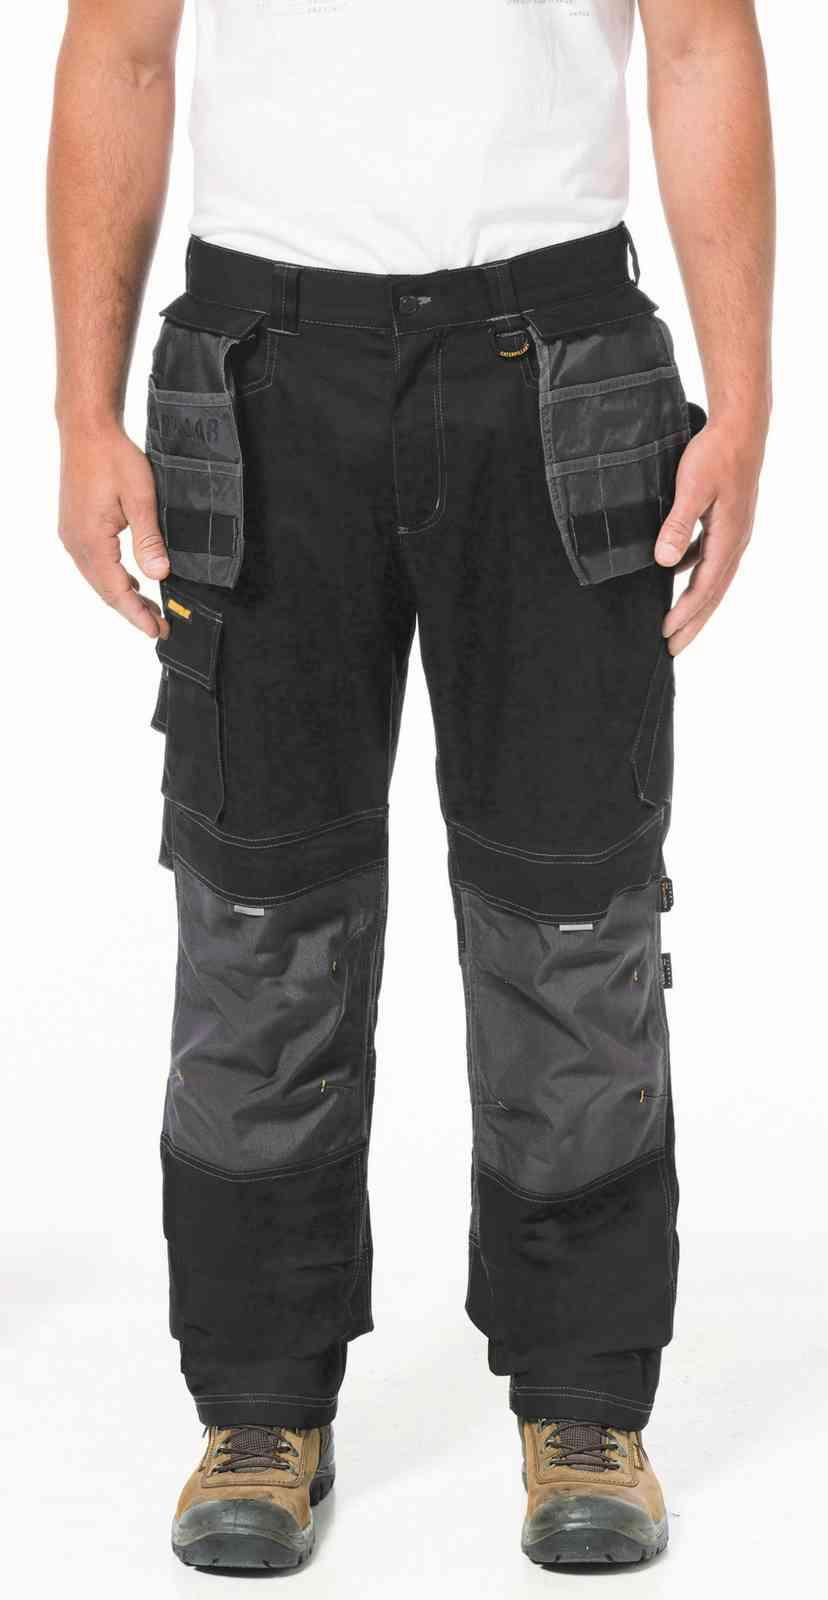 CAT C1810008 H2O Defender Men Work Trousers 9a44d4a977